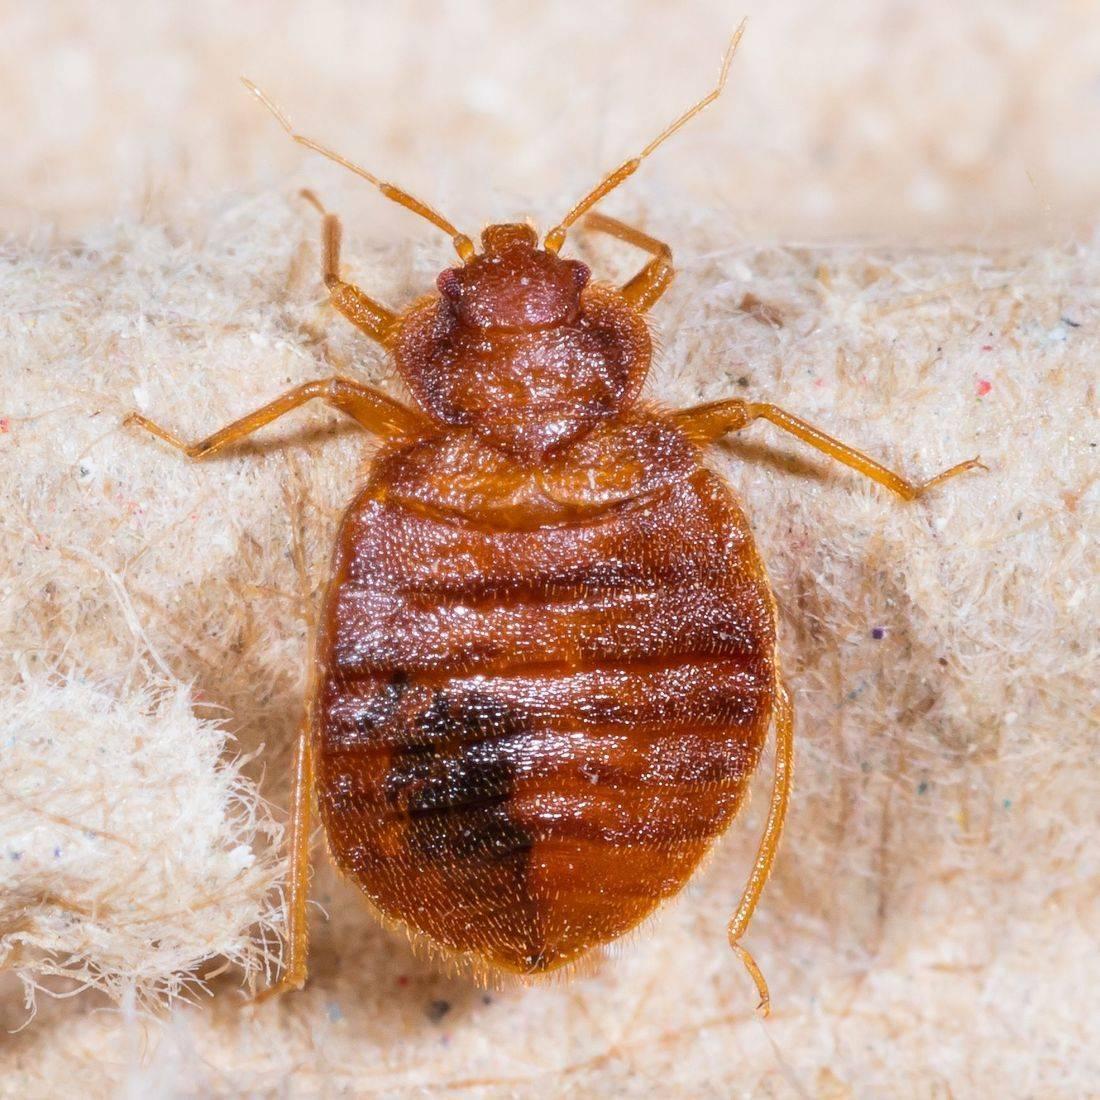 PestAway treats bed bug infestations in Greenock, Port Glasgow, Gourock, Largs and Bishopton